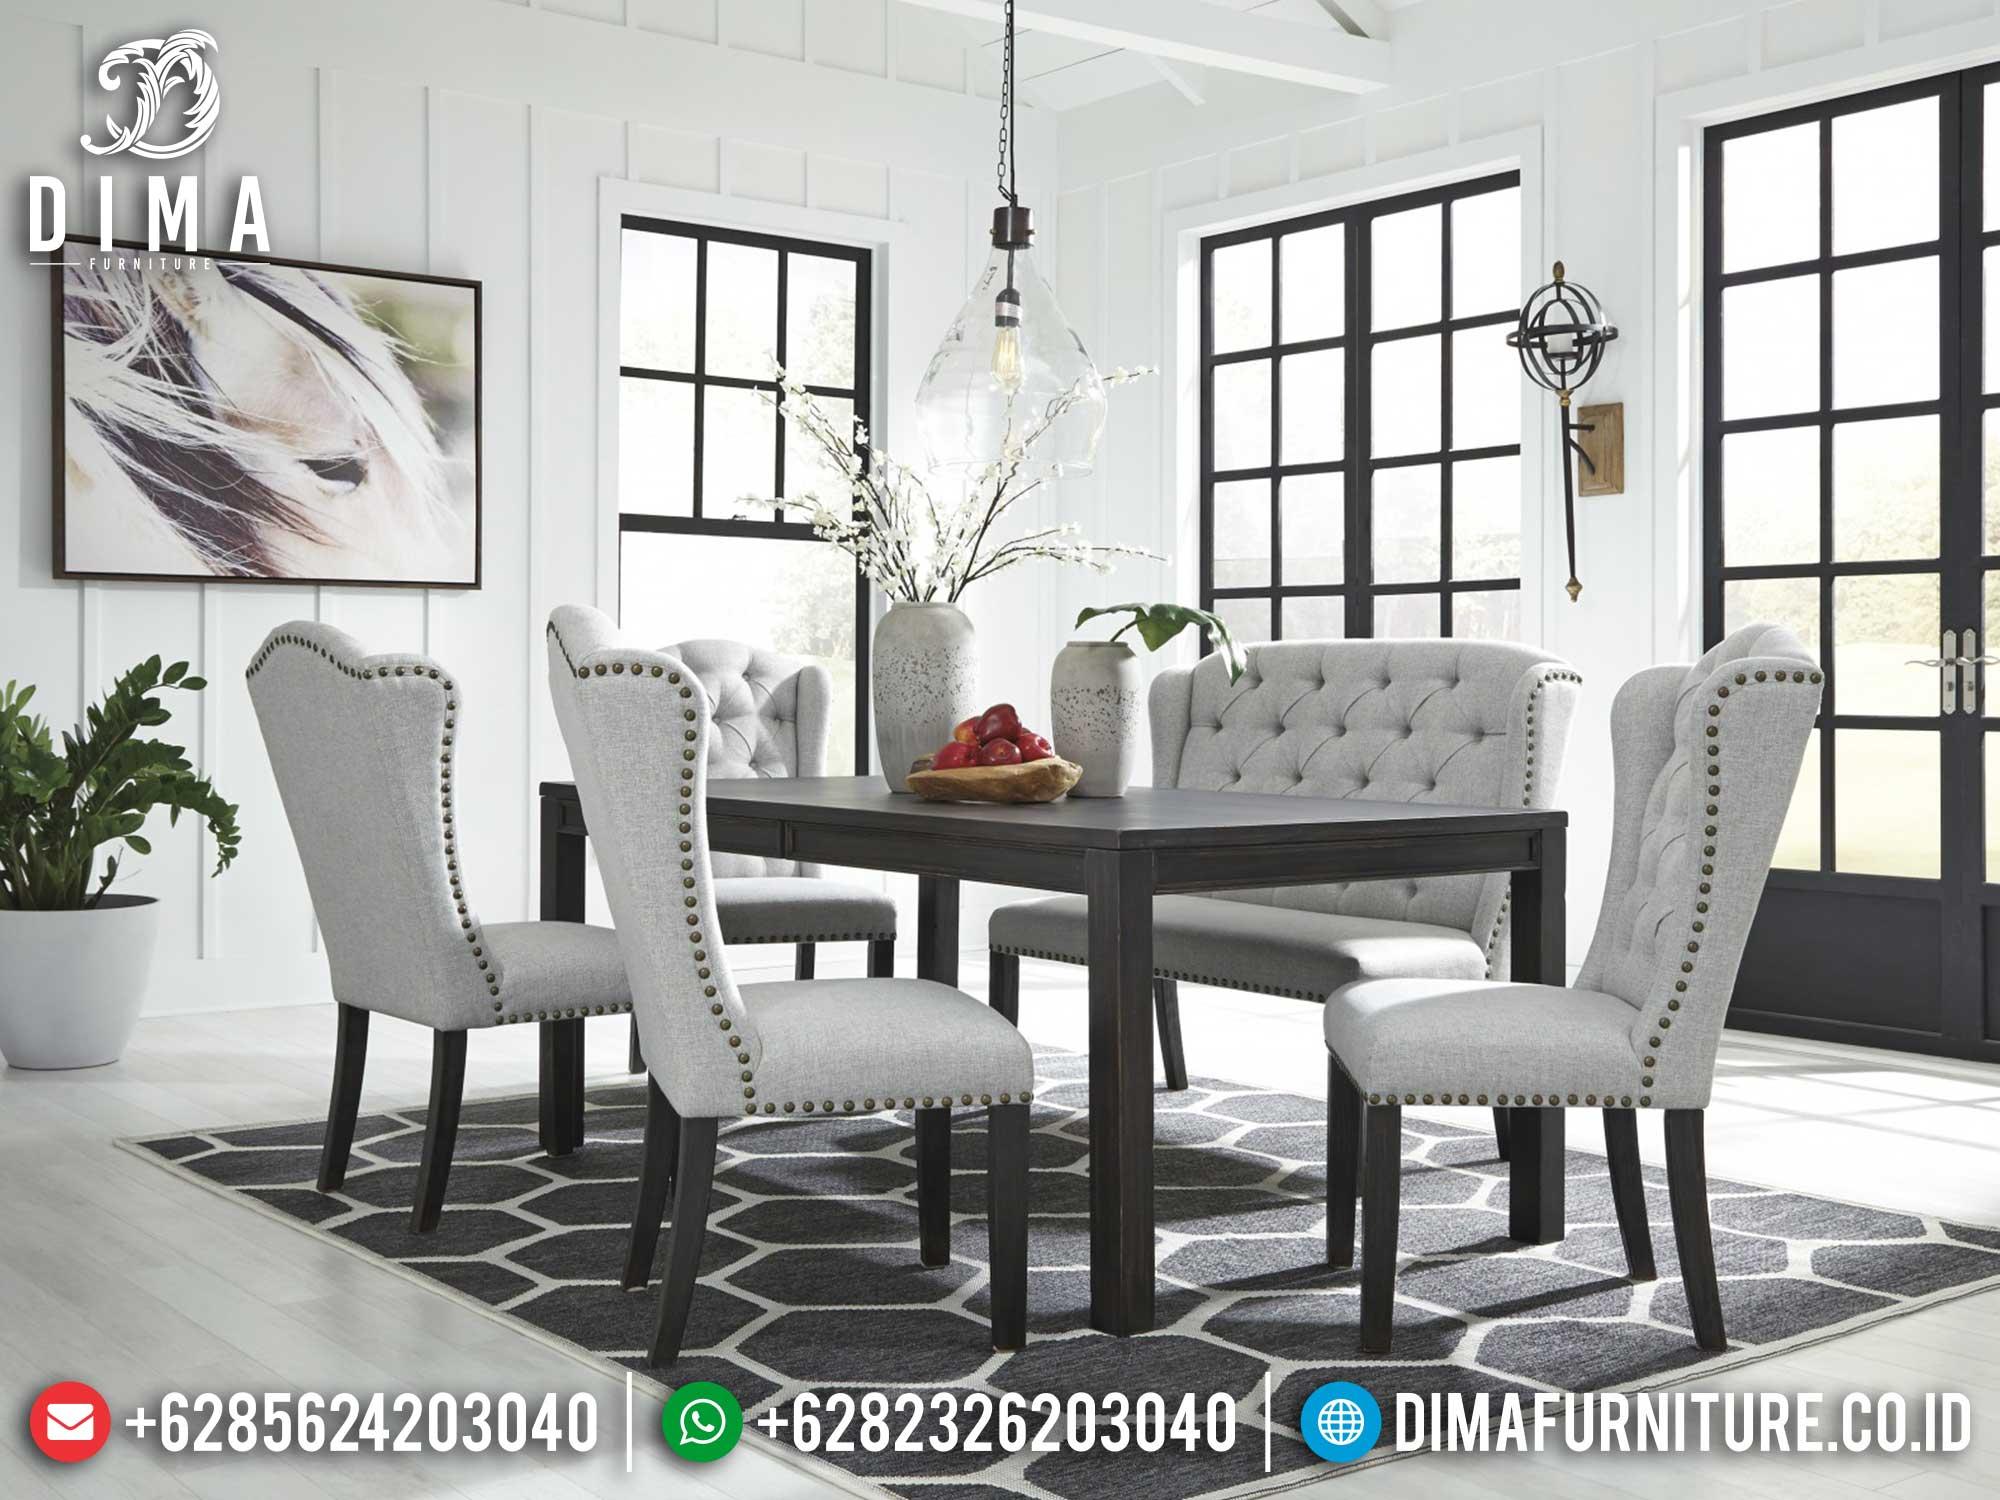 Meja Makan Minimalis Palace Luxury Furniture Jepara Newest ST-1205